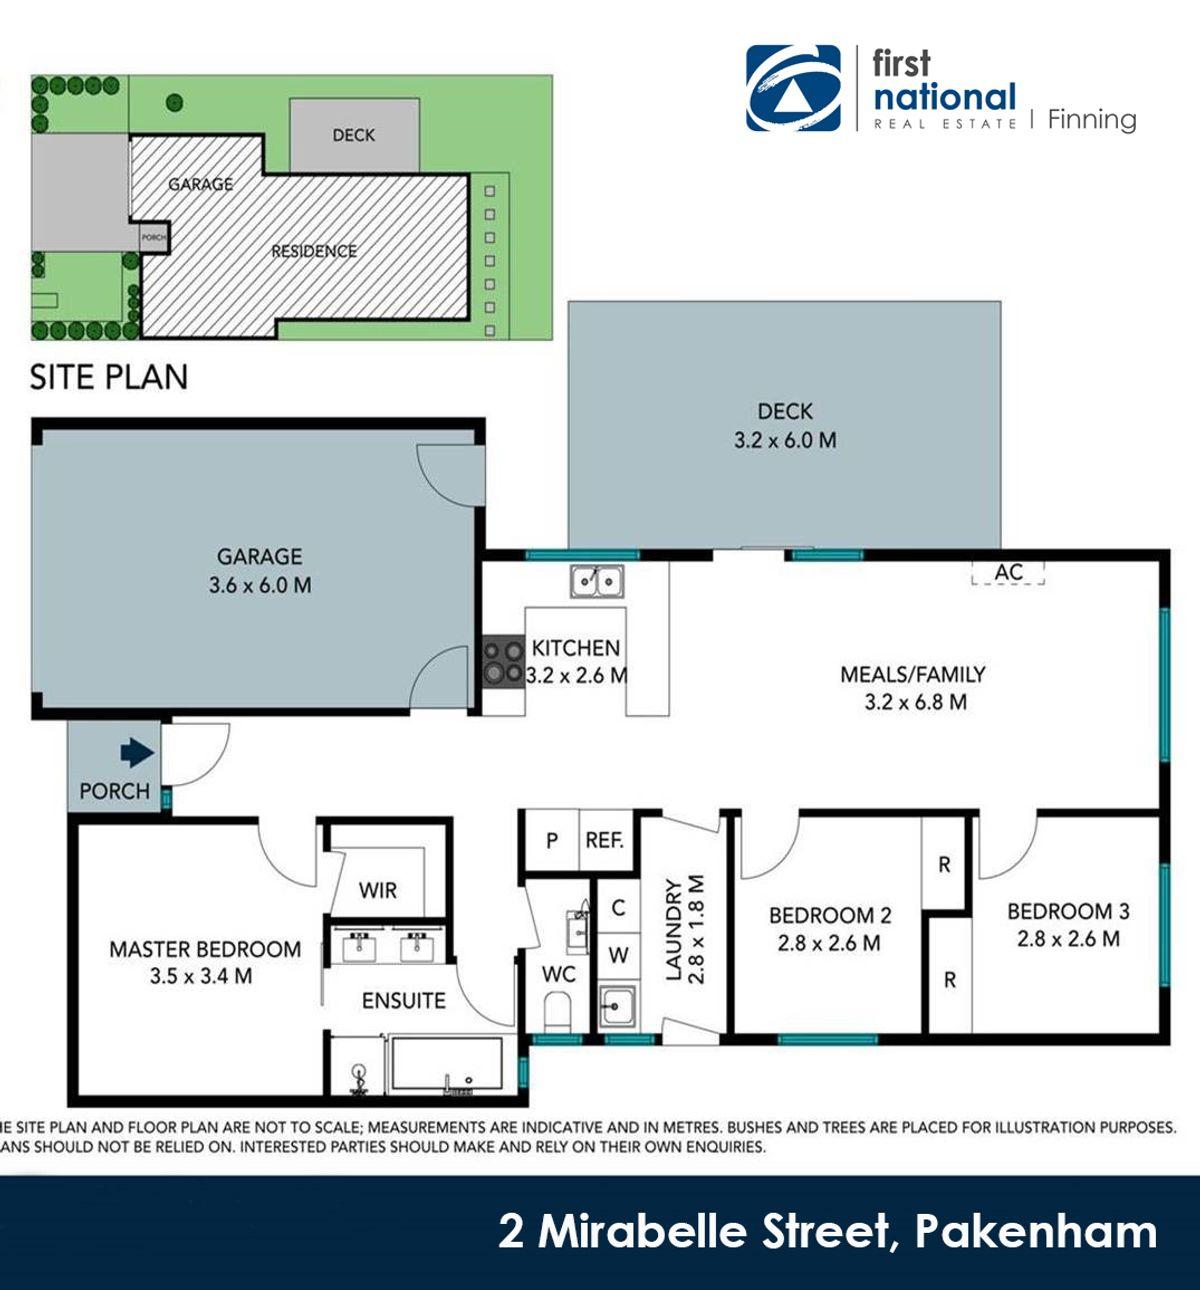 2 Mirabelle Street, Pakenham, VIC 3810